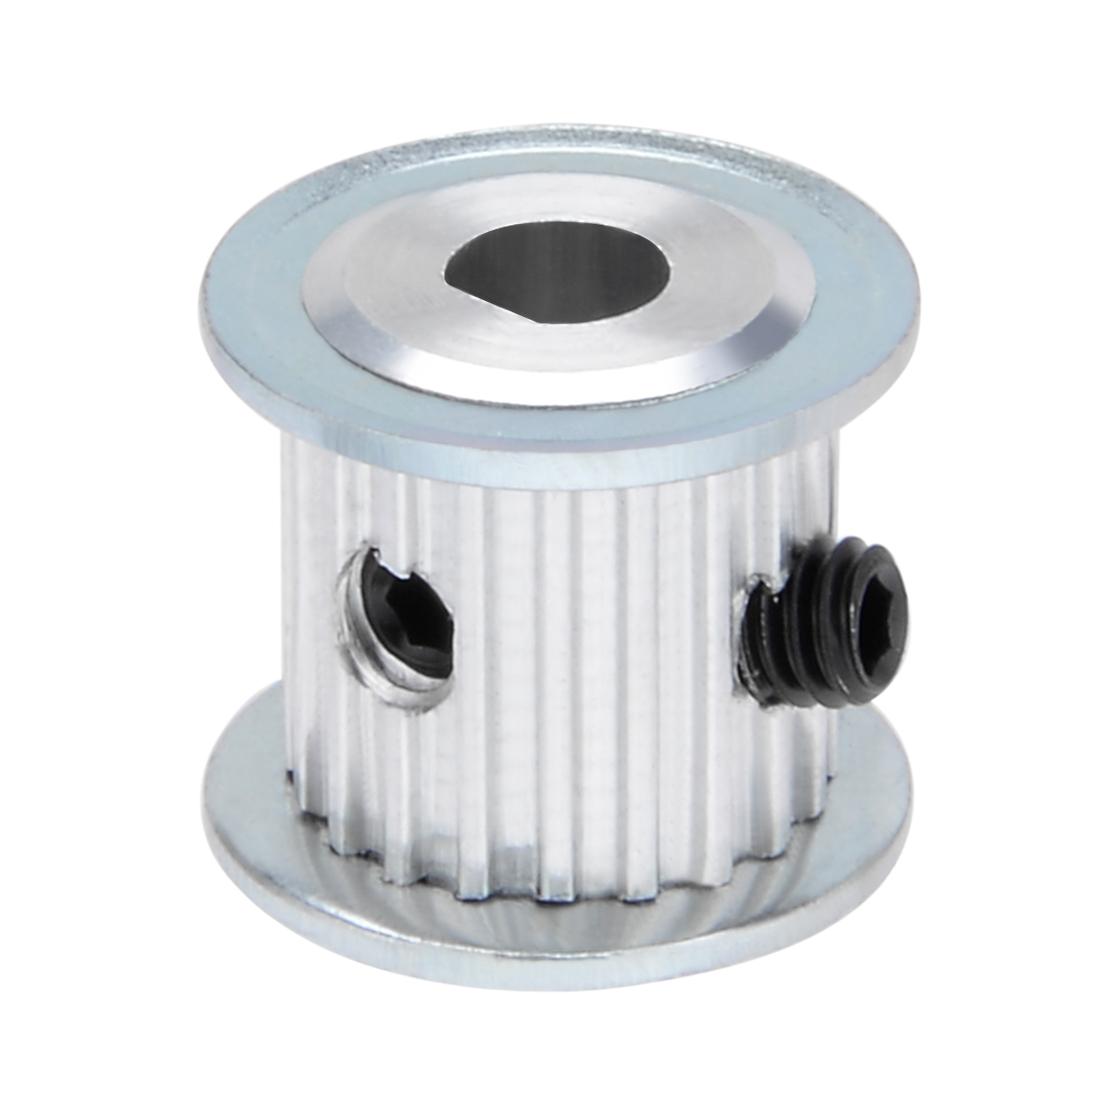 Aluminum MXL 20 Teeth 5mmx4.5mm D-Shape Bore 11mm Belt Timing Idler Pulley Wheel - image 6 of 6